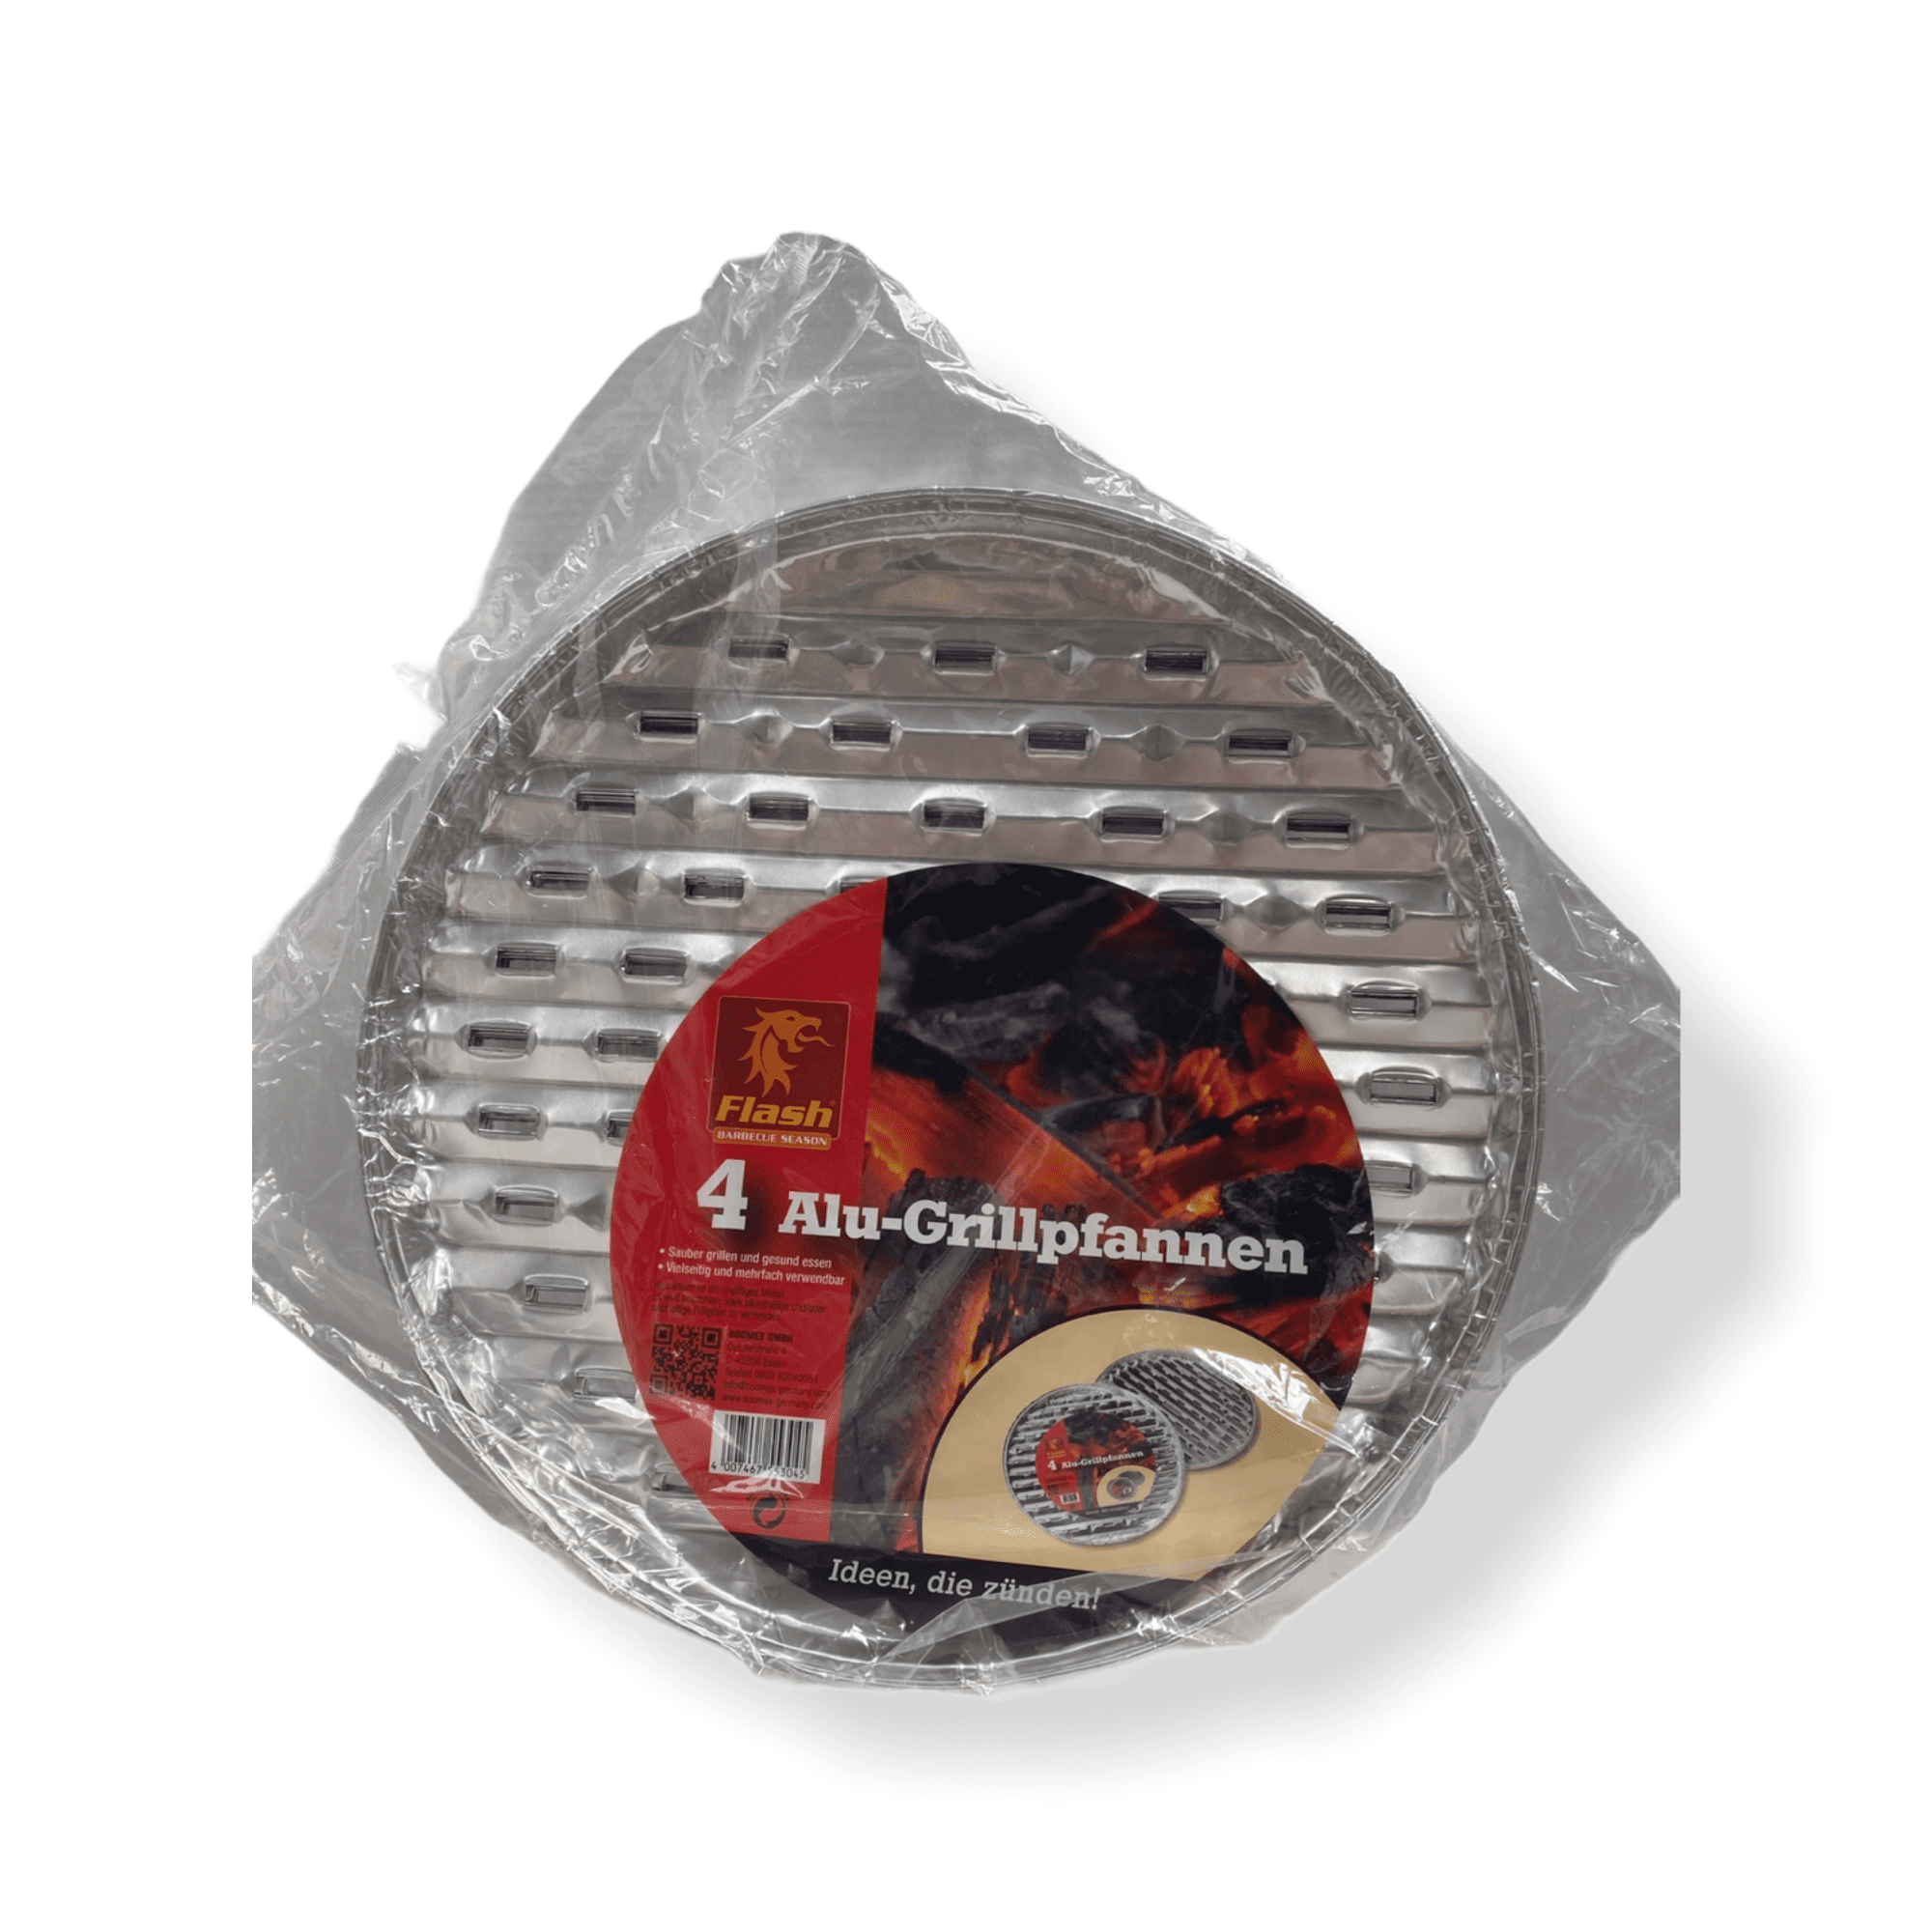 4er Set Alu-Grillpfannen